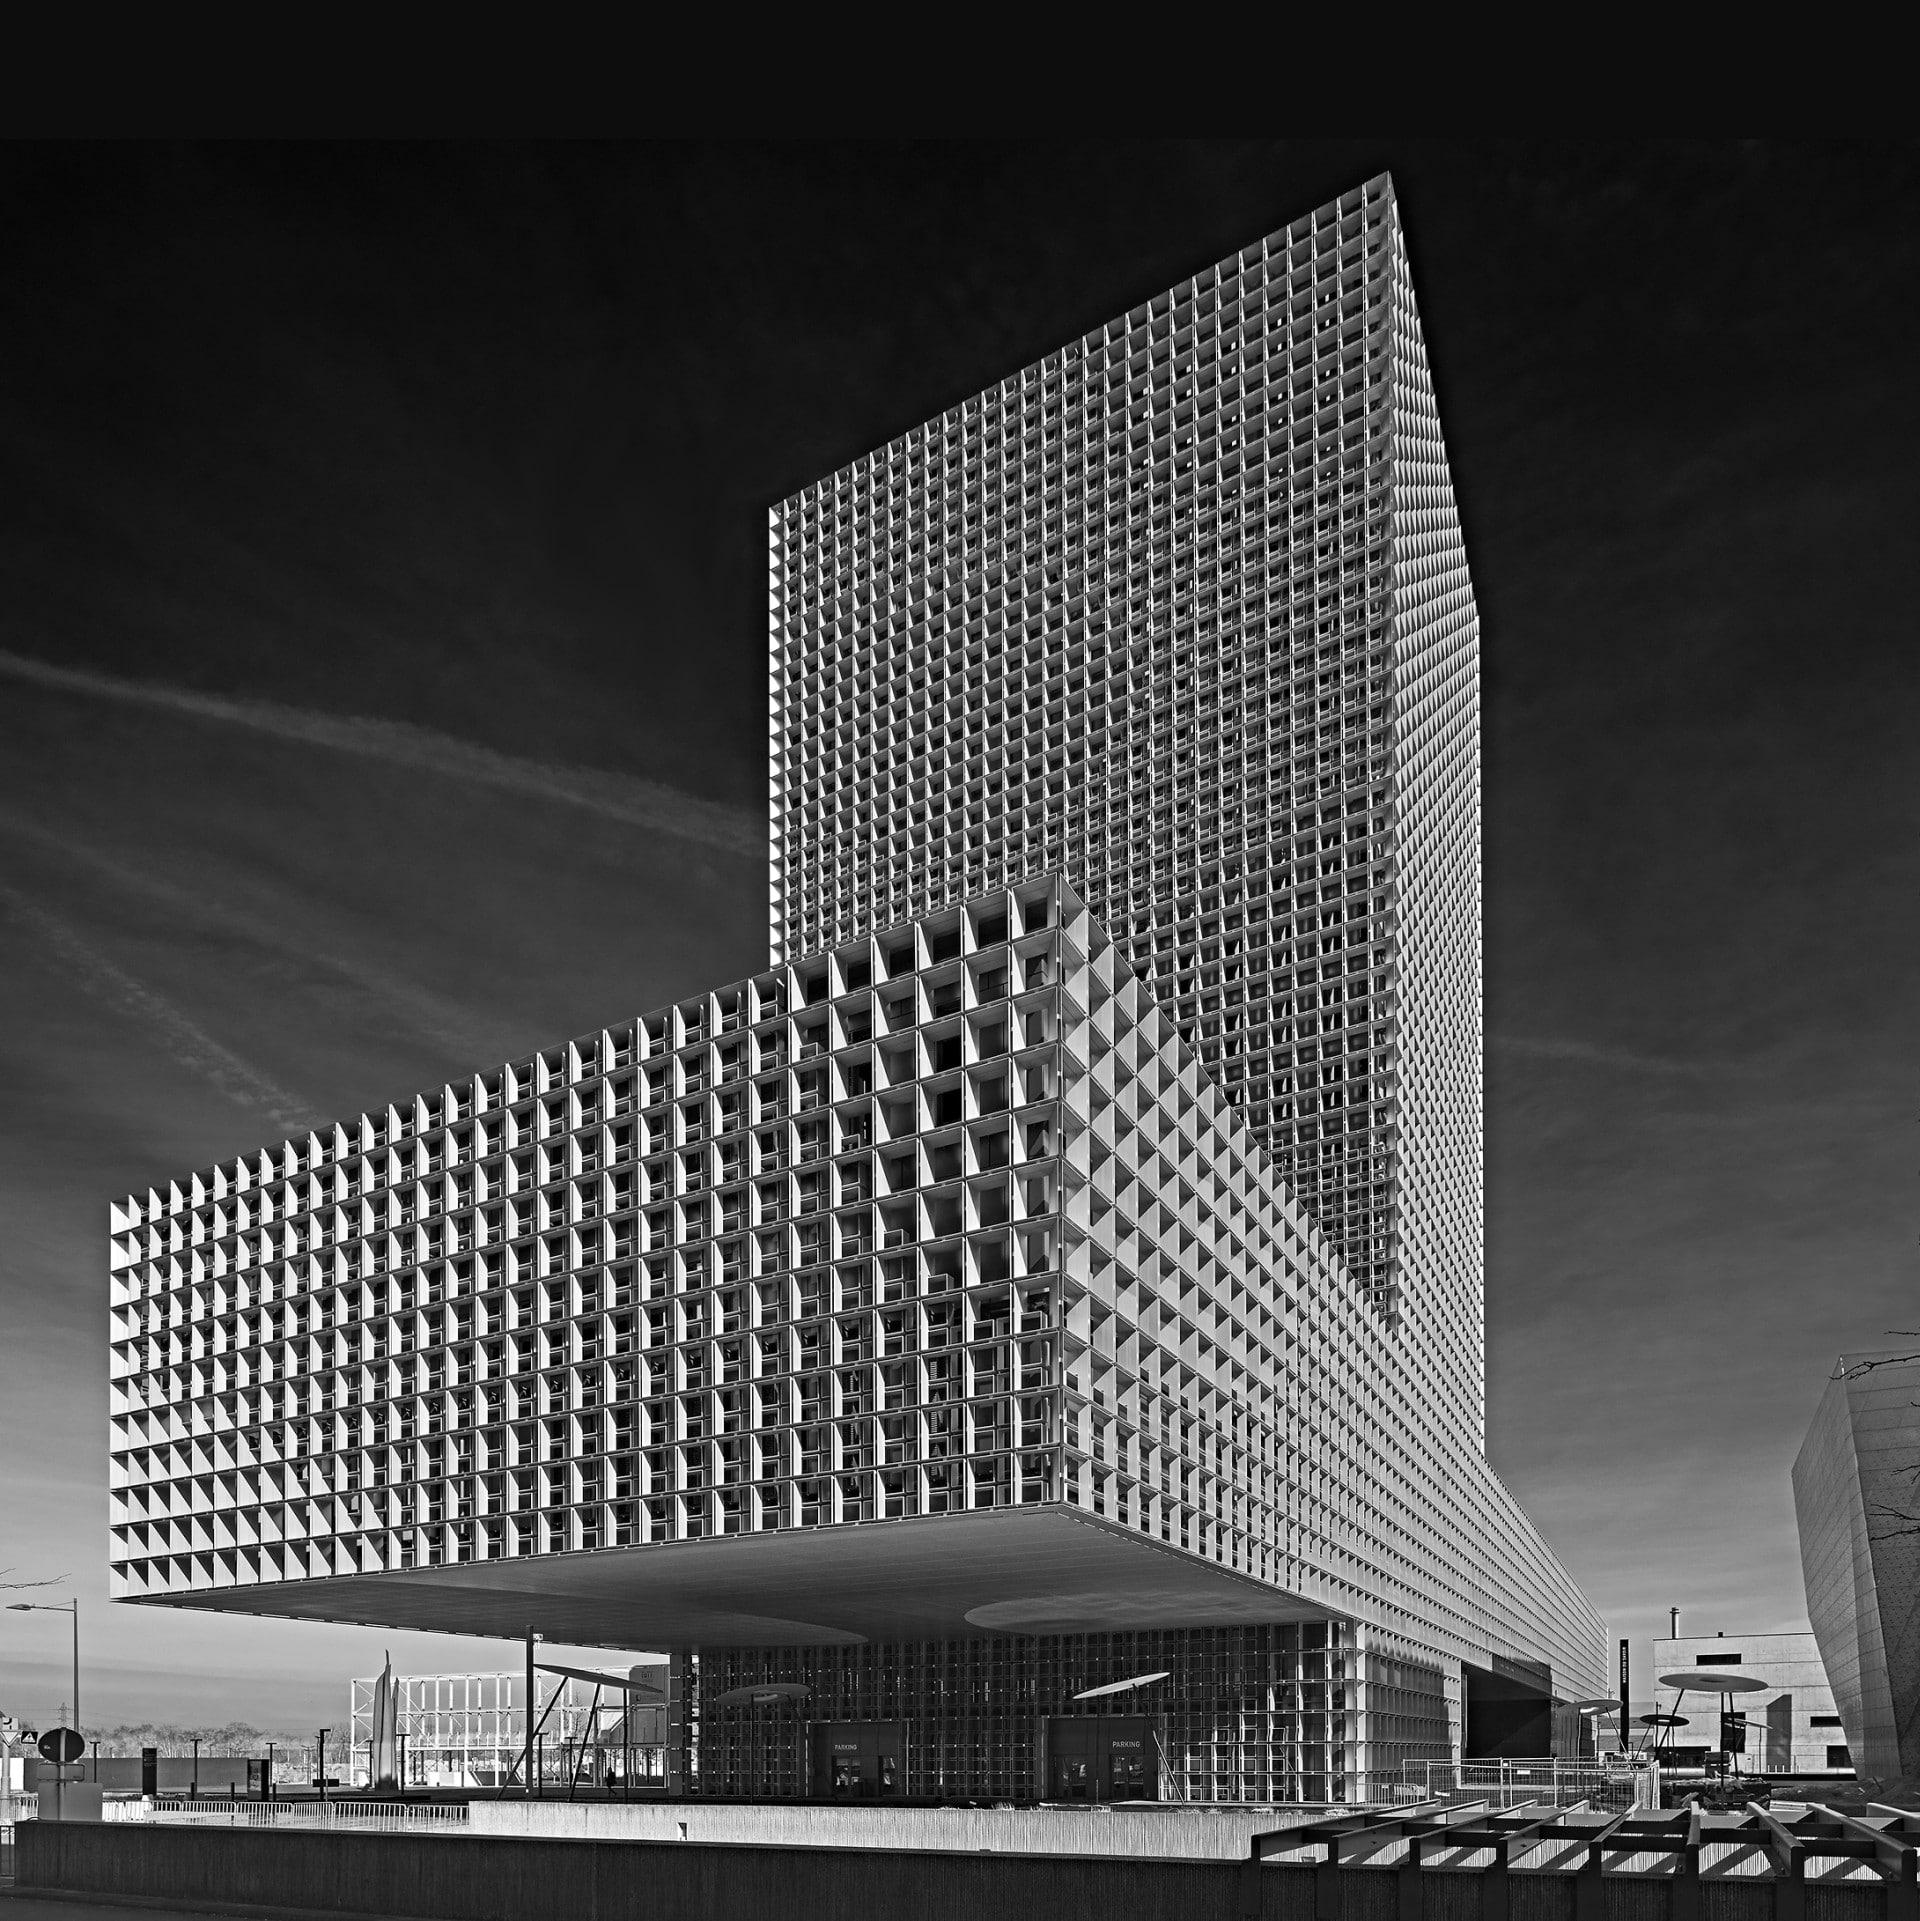 245-LUKAS-HUNEKE-PHOTOGRAPHY-Architekturfotos-r4KapEAr